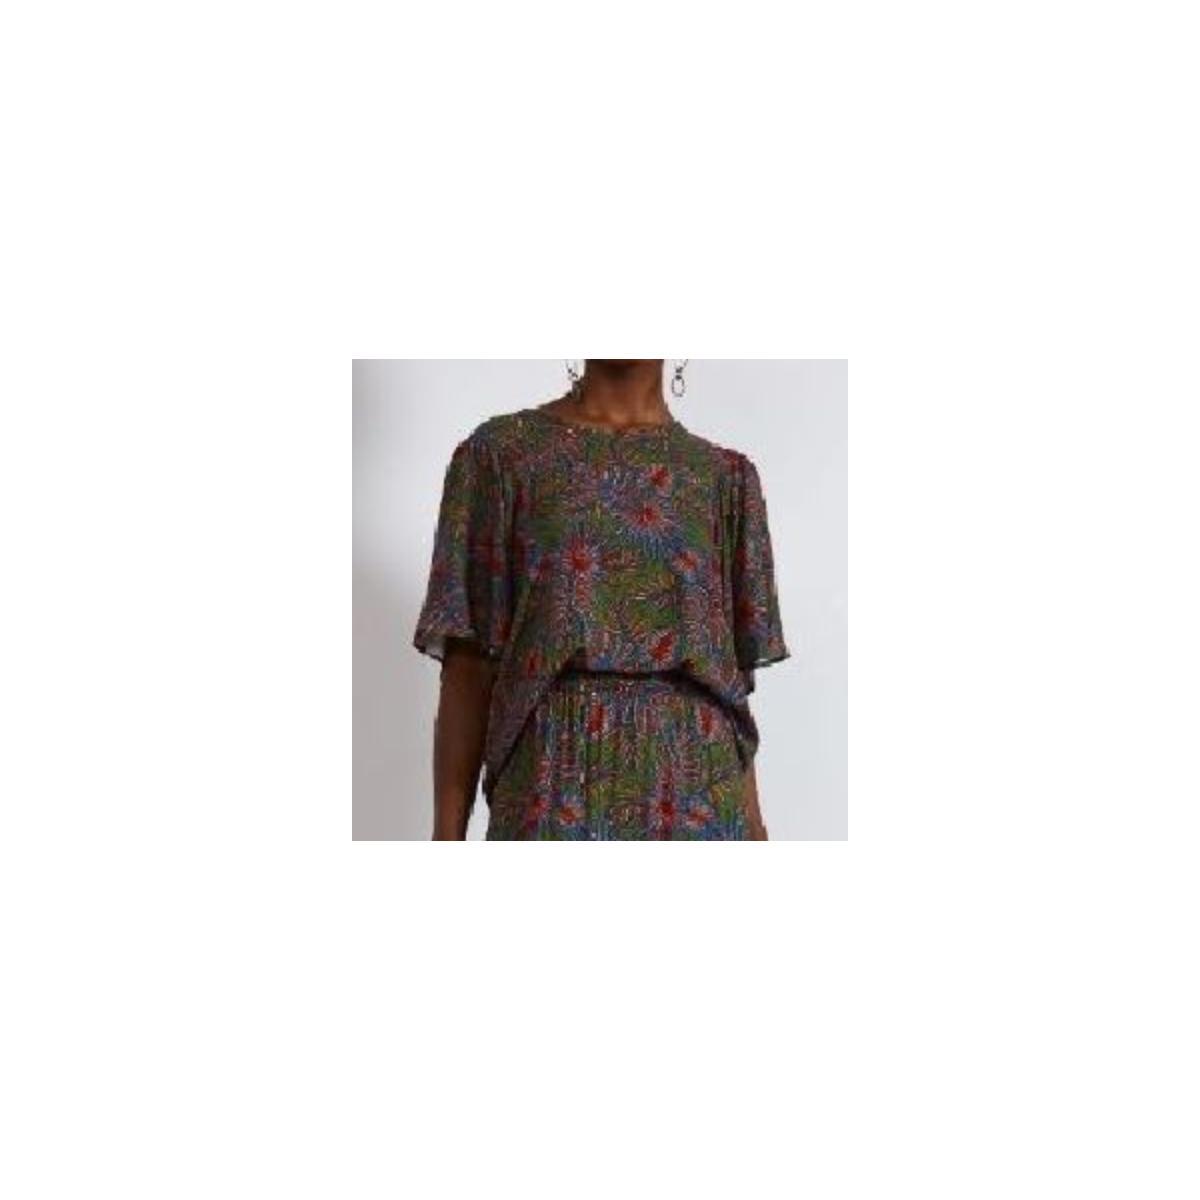 Blusa Feminina Colcci 360115544 Vc344 Verde Estampado